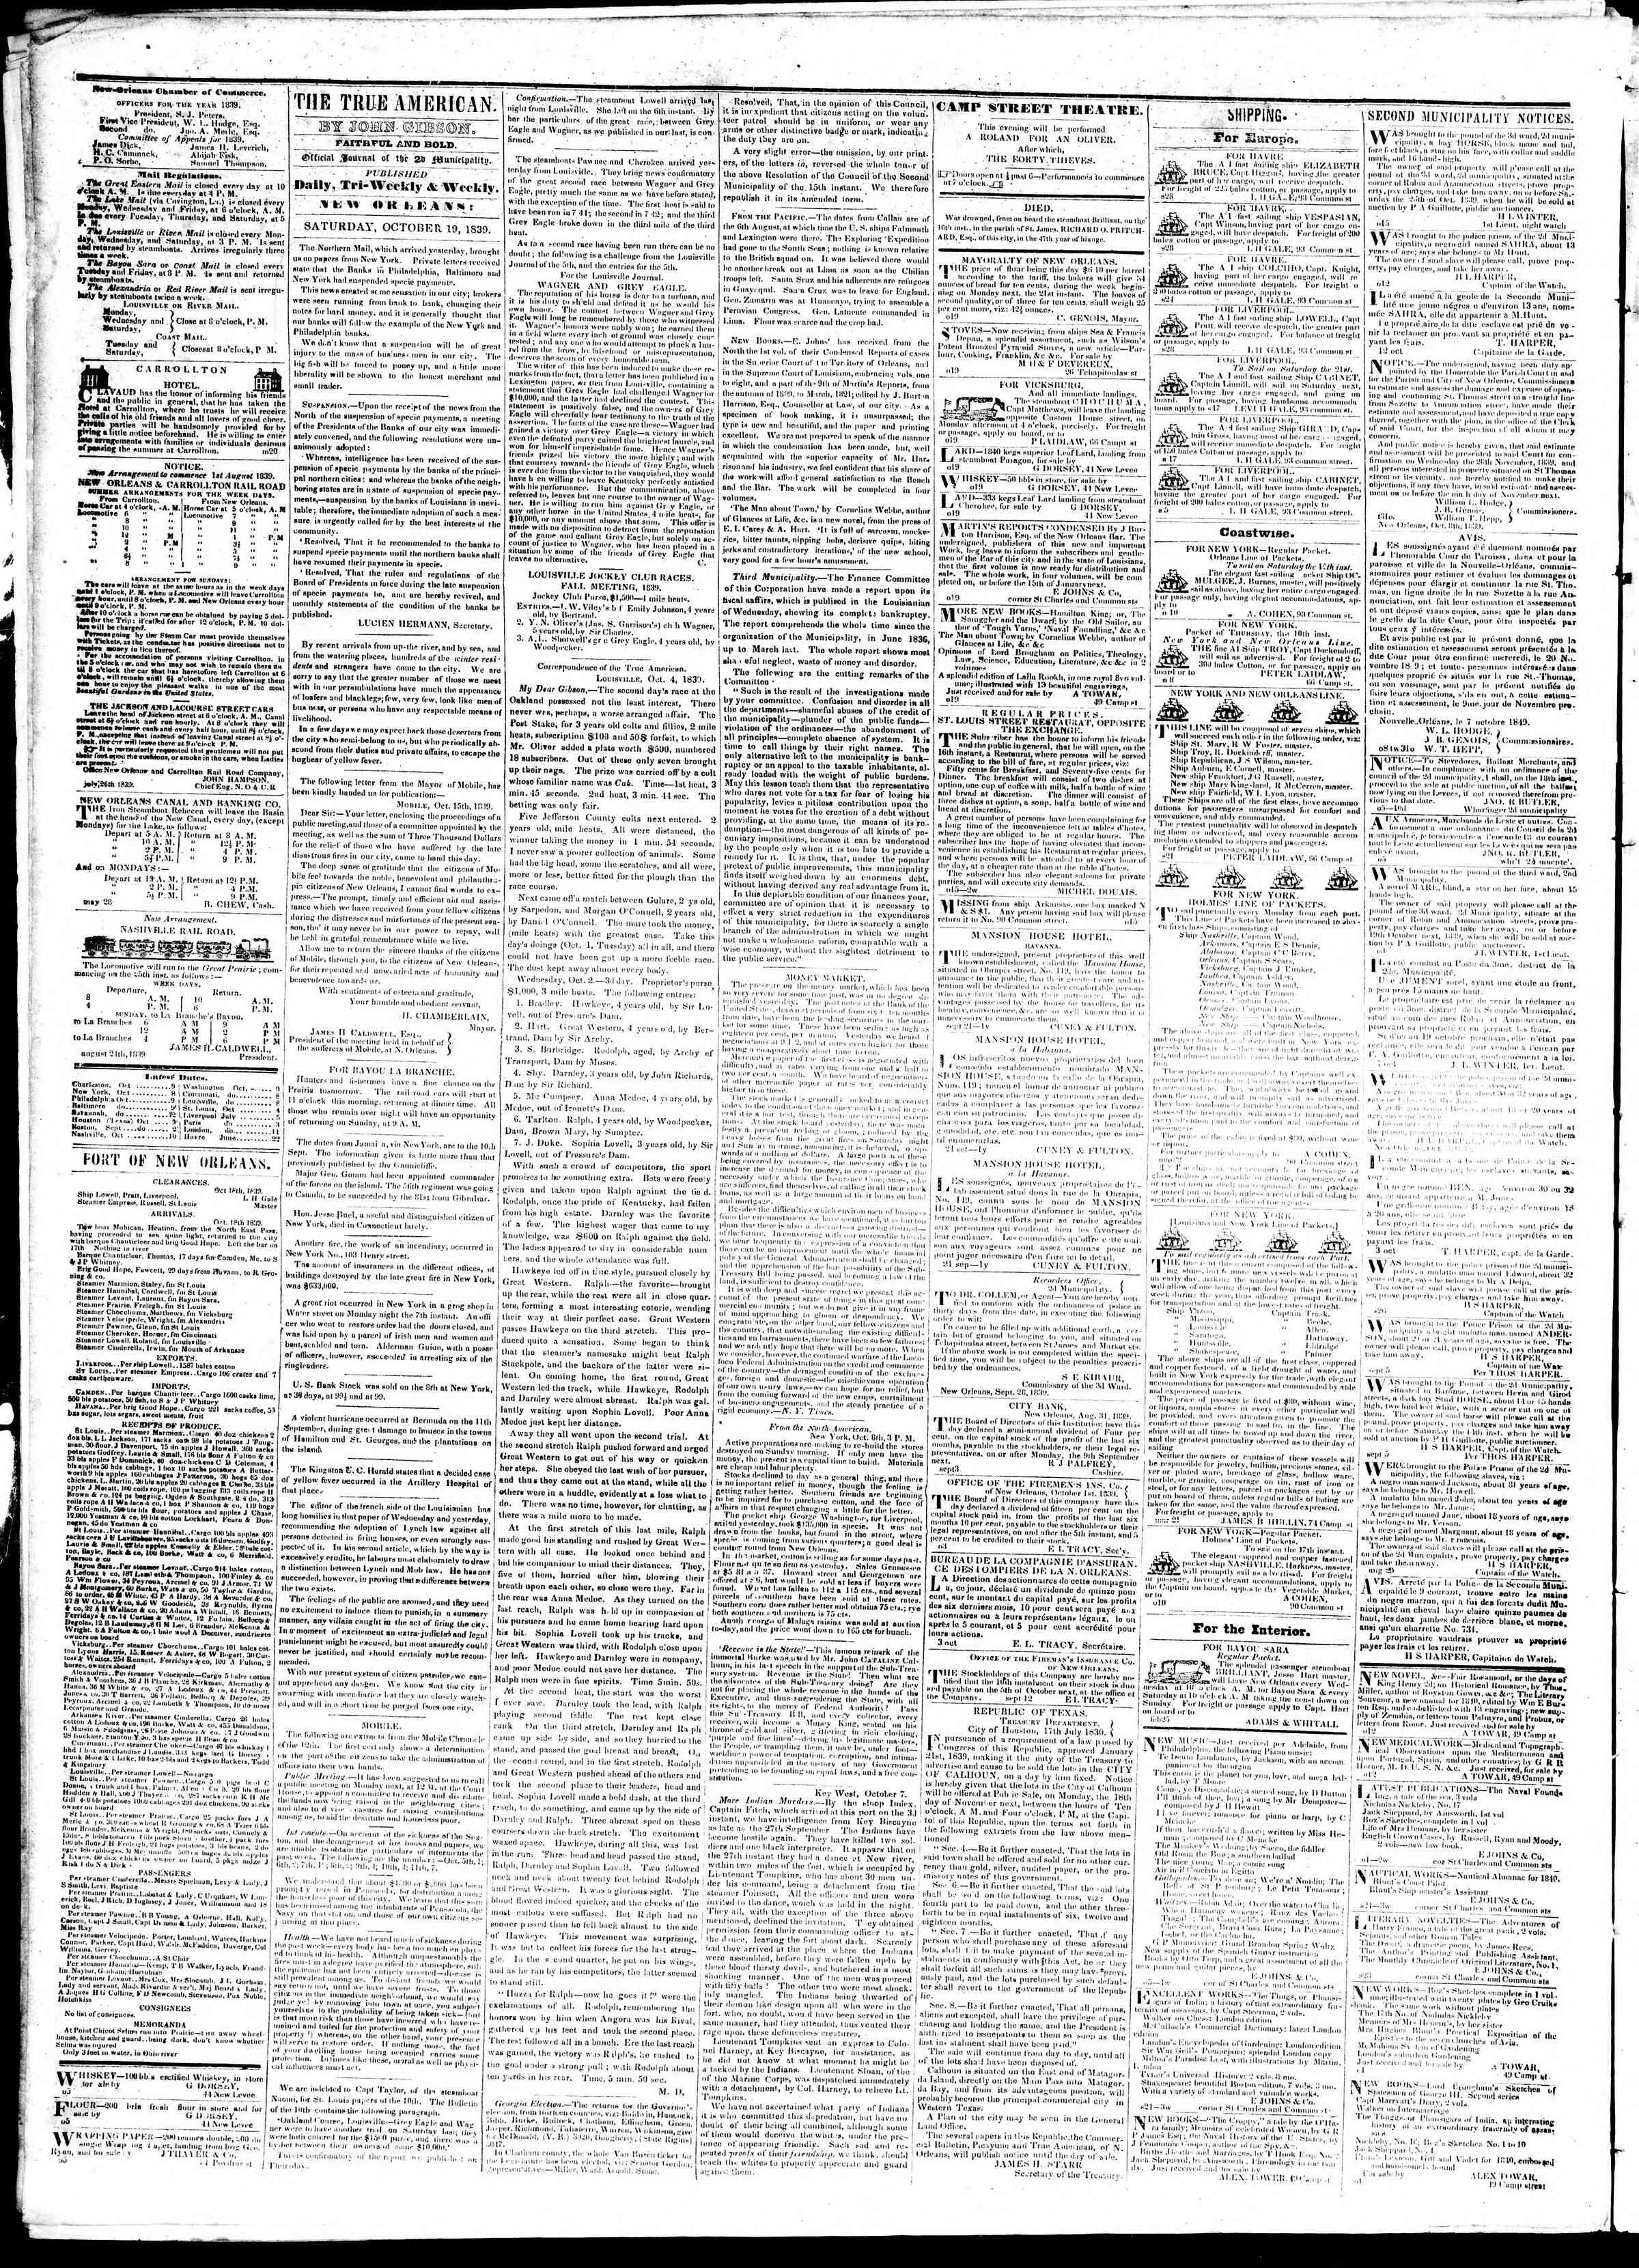 October 19, 1839 Tarihli True American Gazetesi Sayfa 2